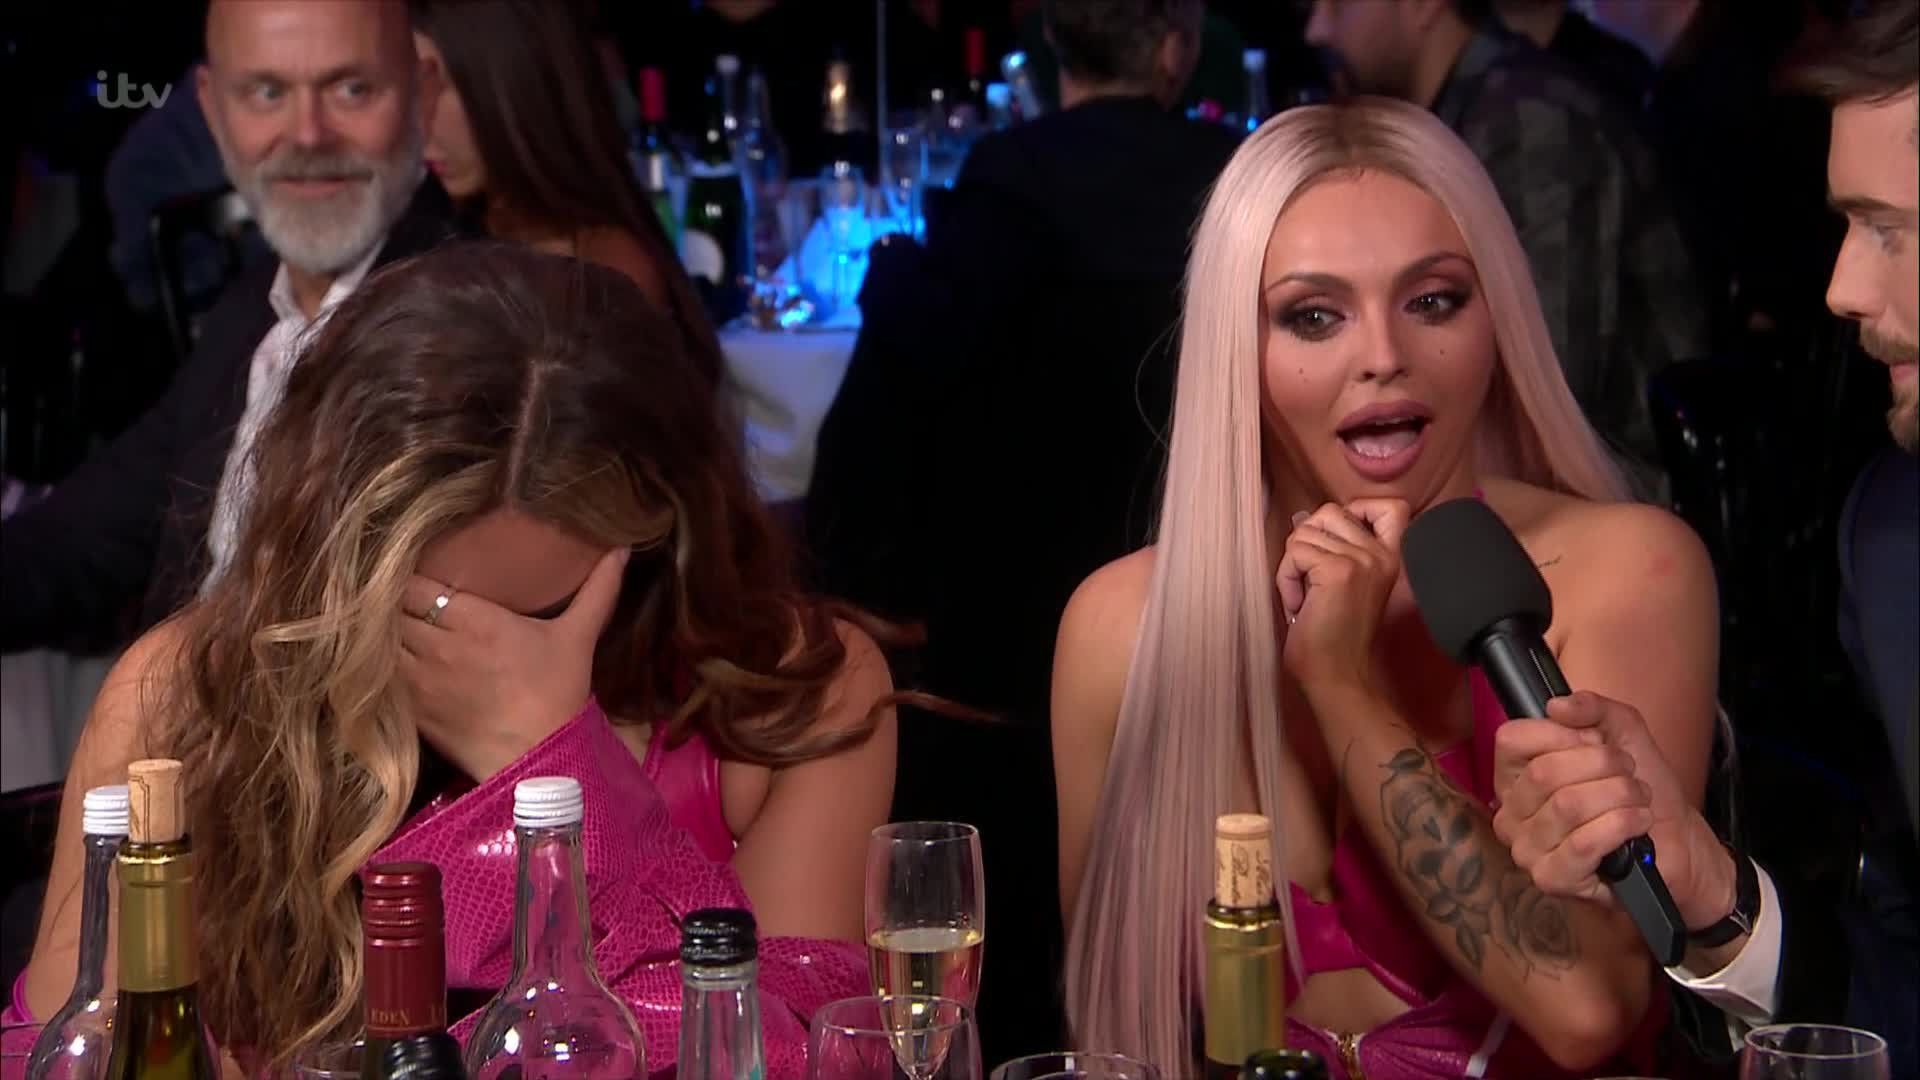 Brit Wards 2019 Awkward Jack Whitehall Little Mix Picture: ITV METROGRAB